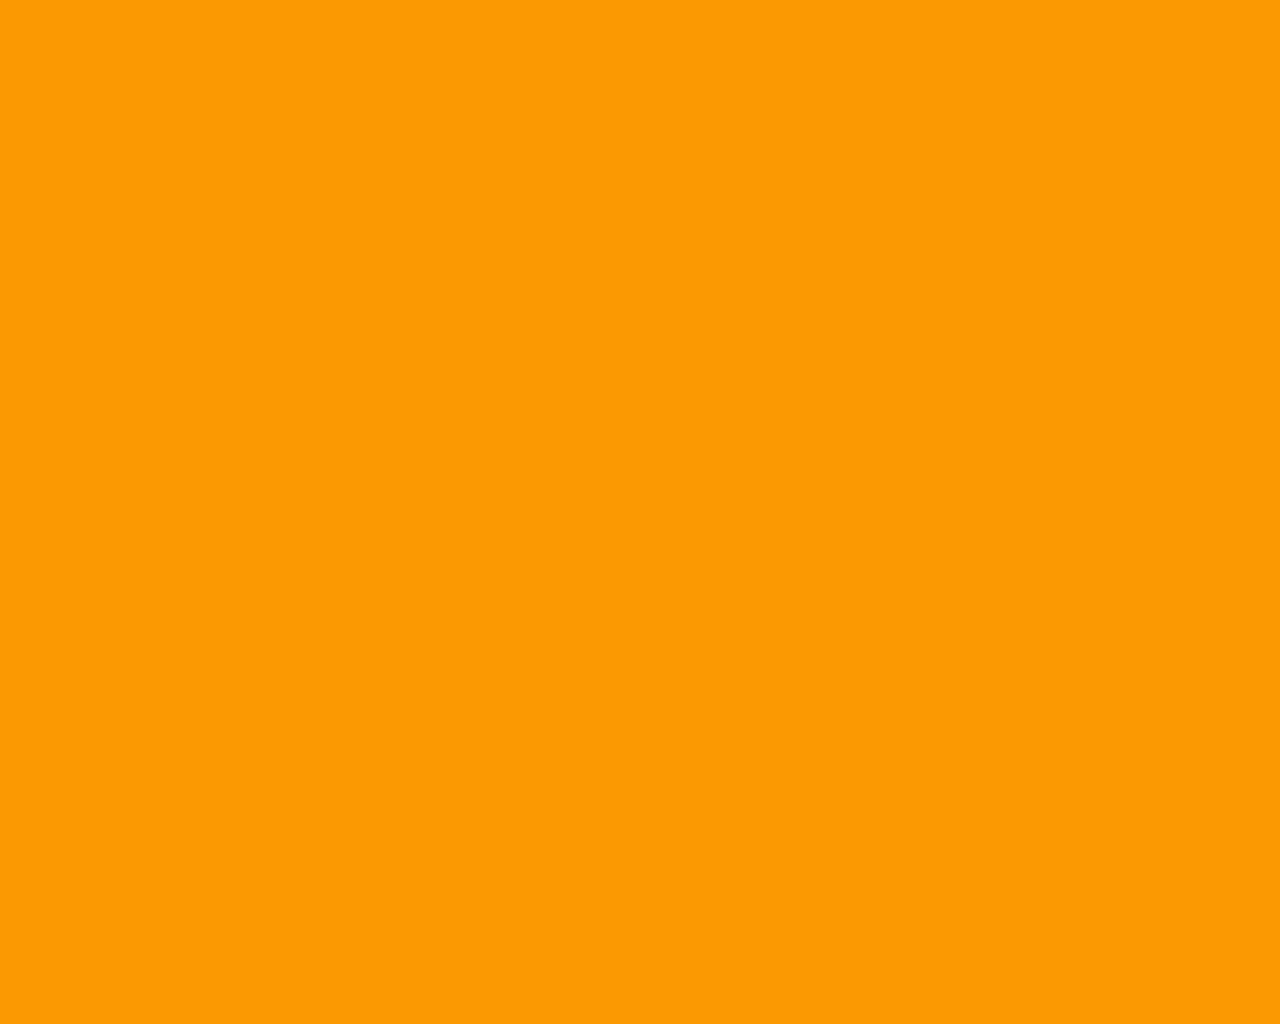 1280x1024 Orange RYB Solid Color Background